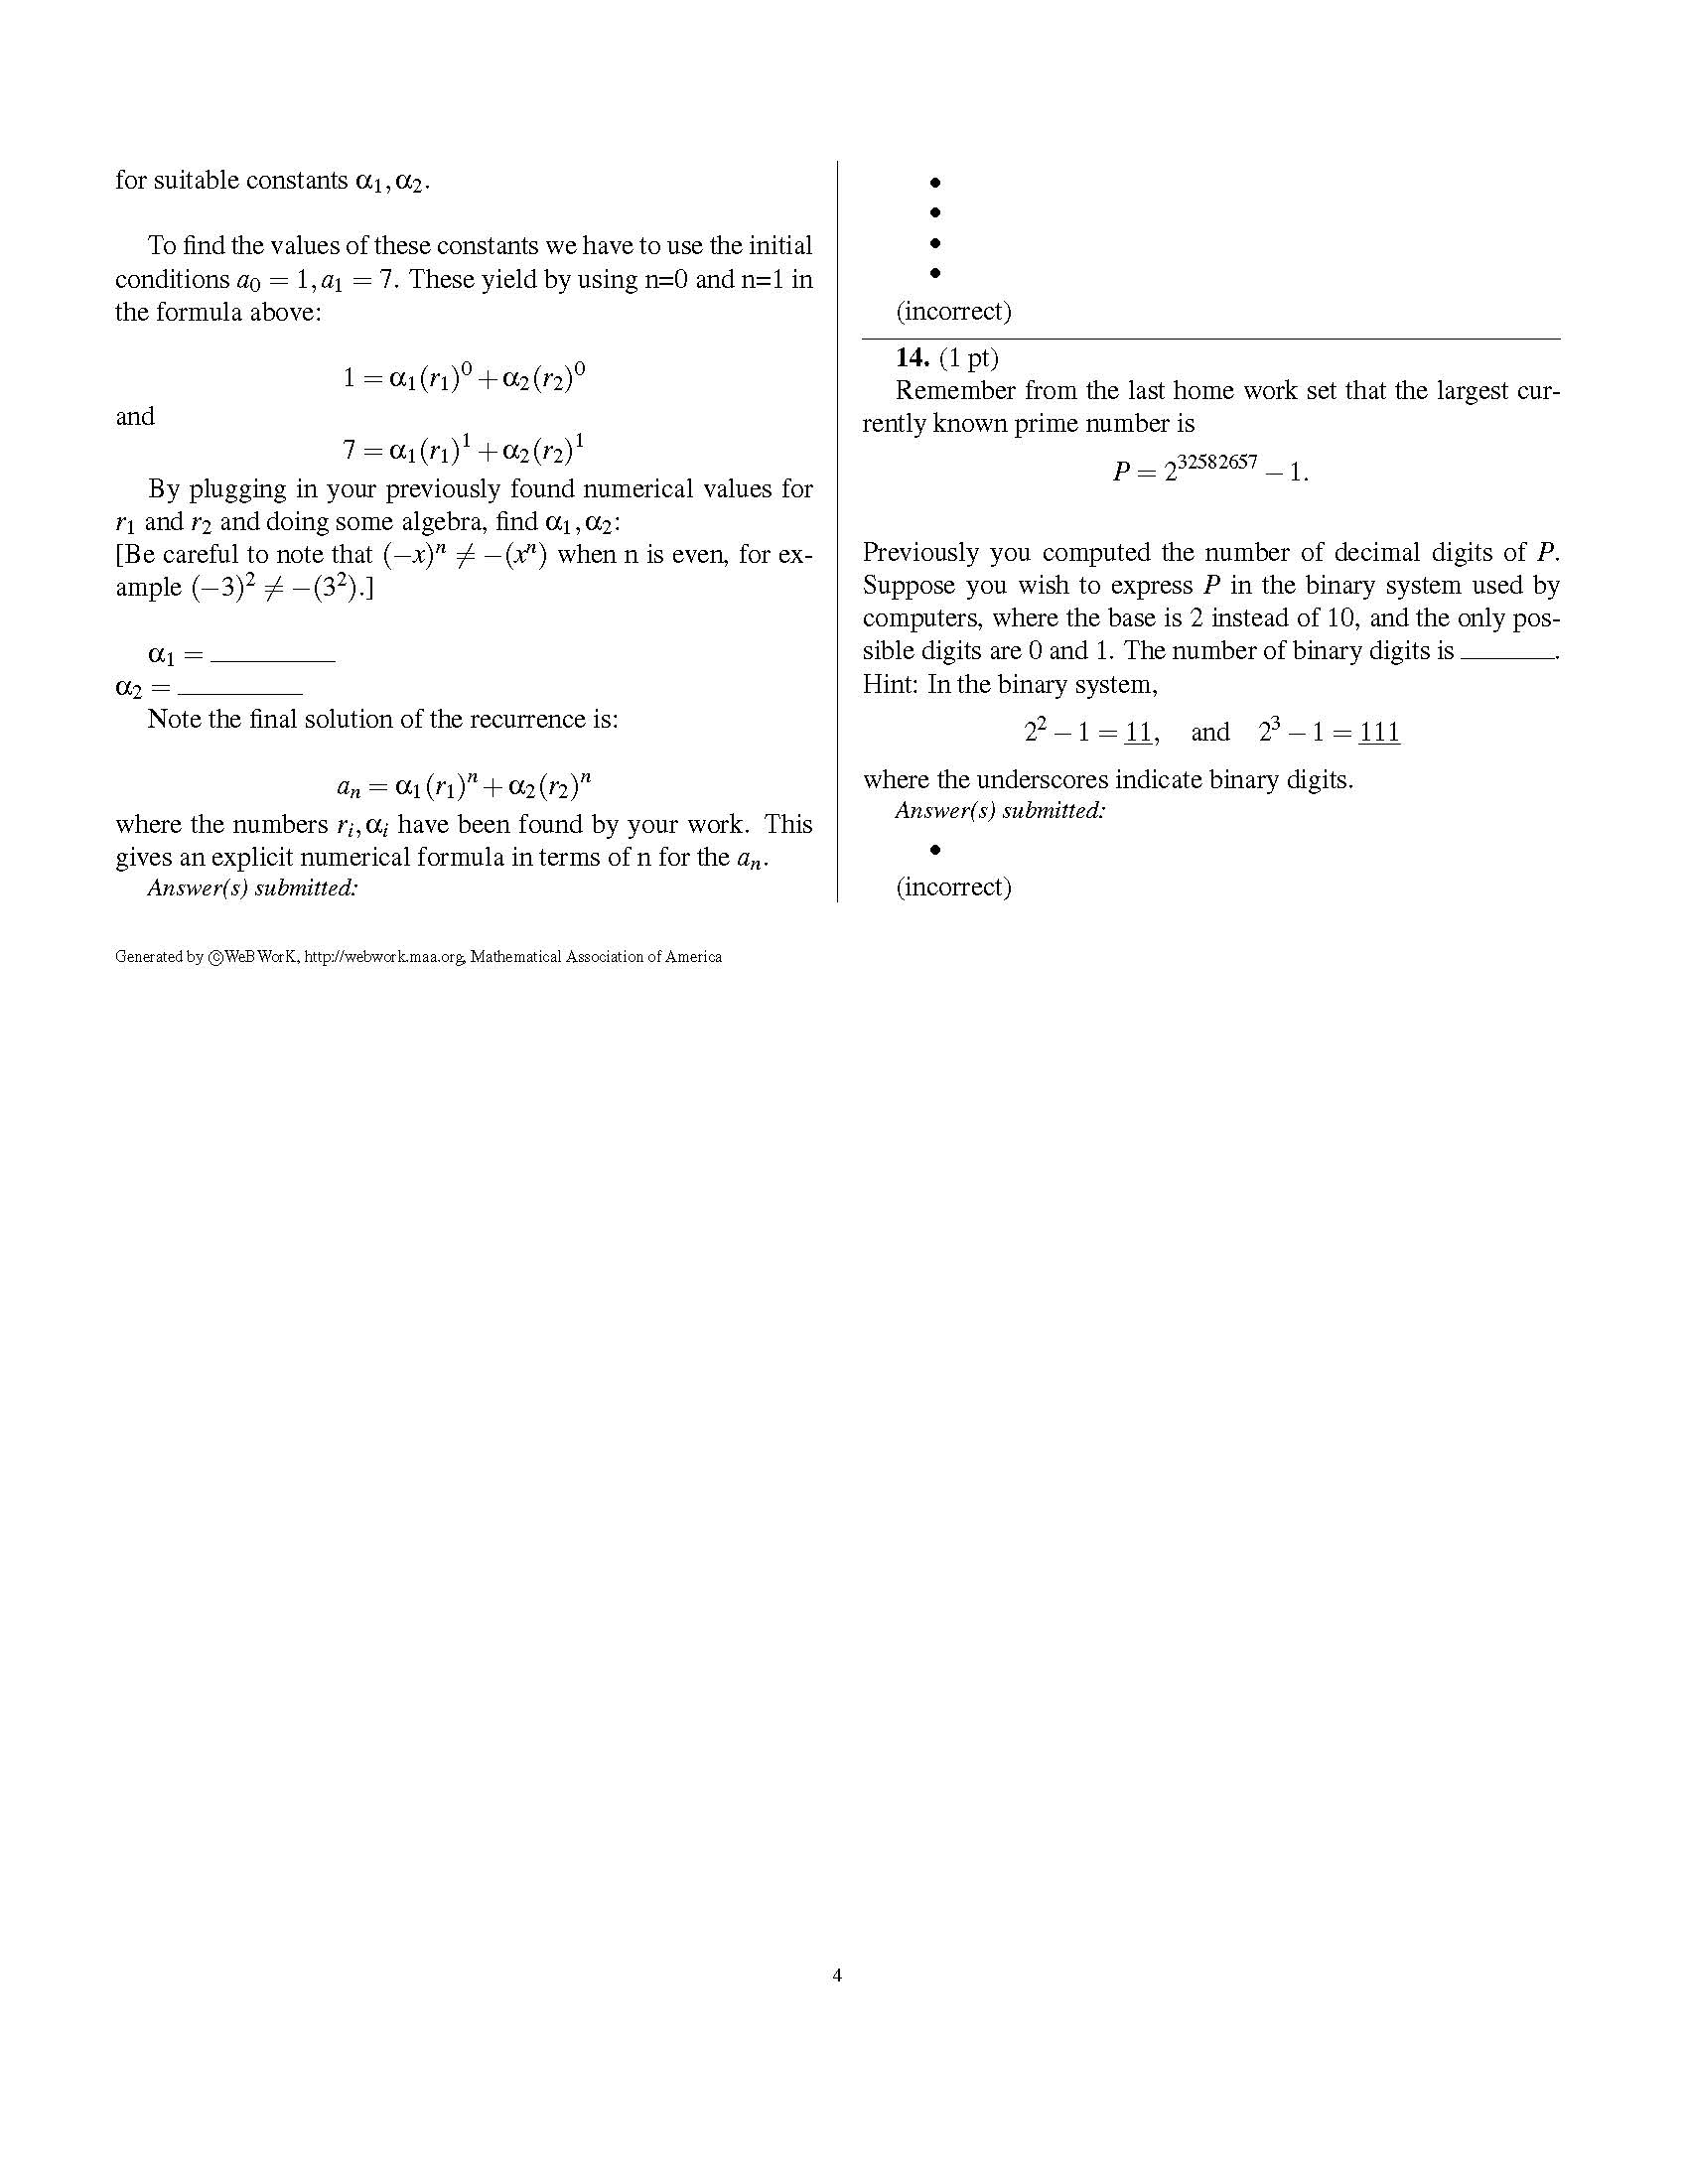 Homework recurrence solution